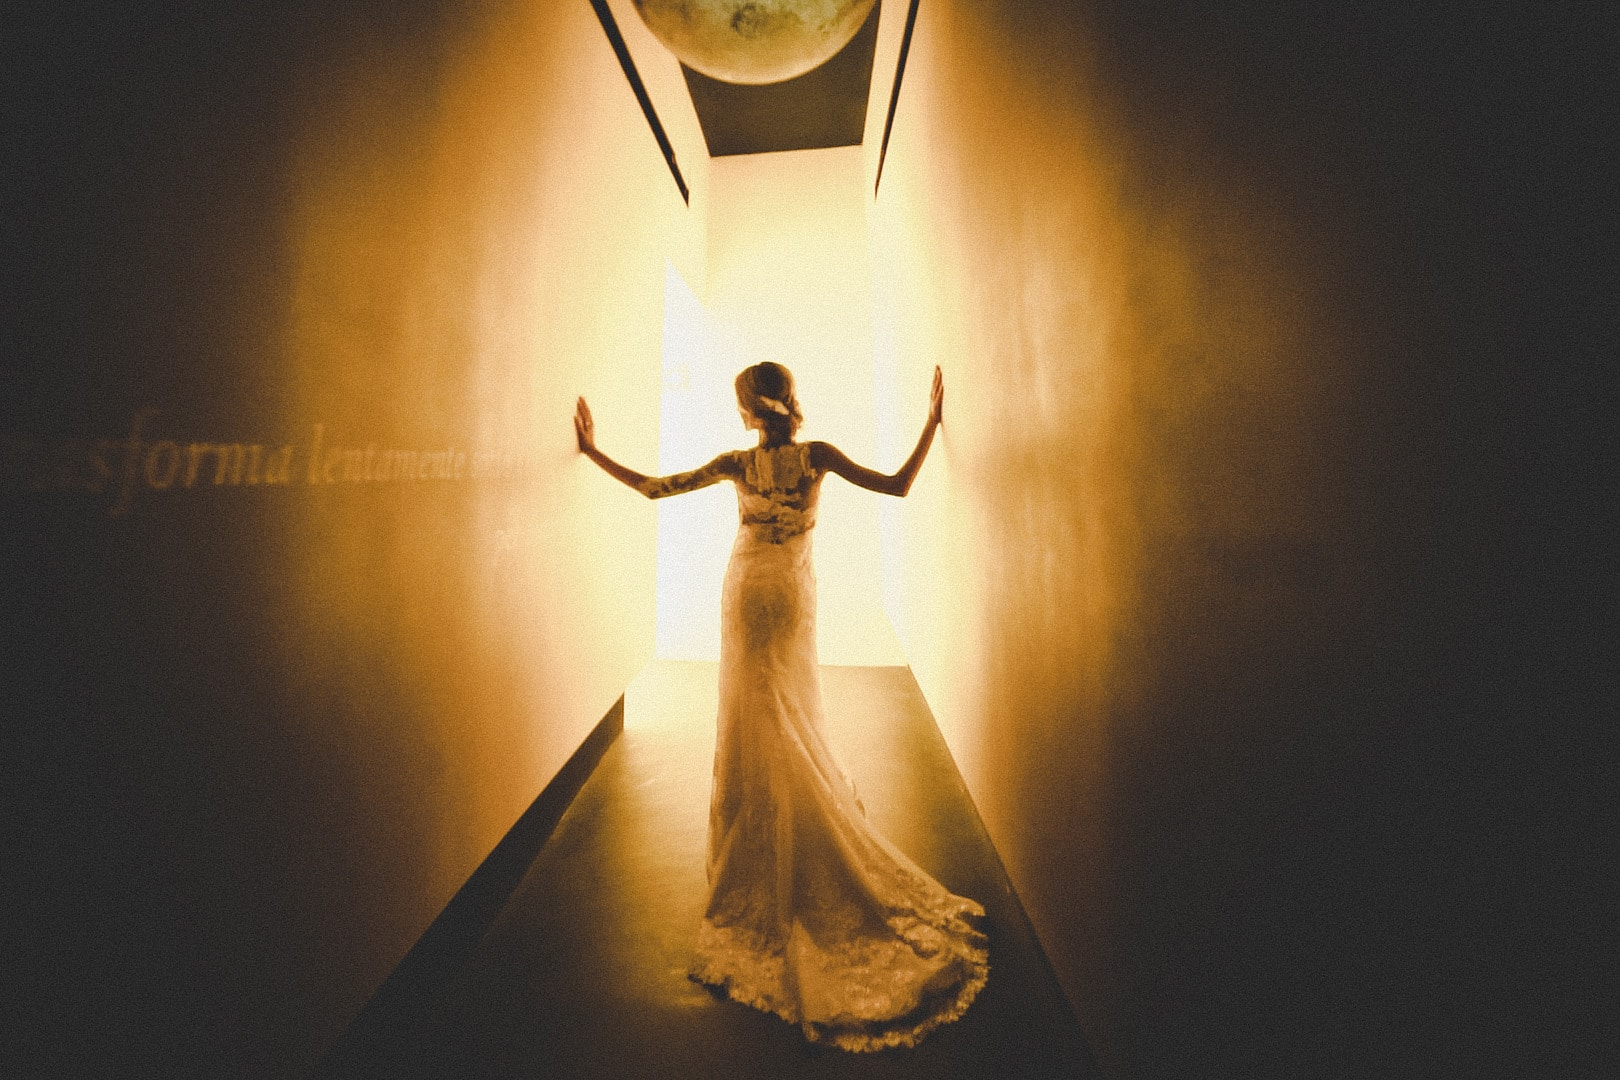 suggestive image of a trash the dress